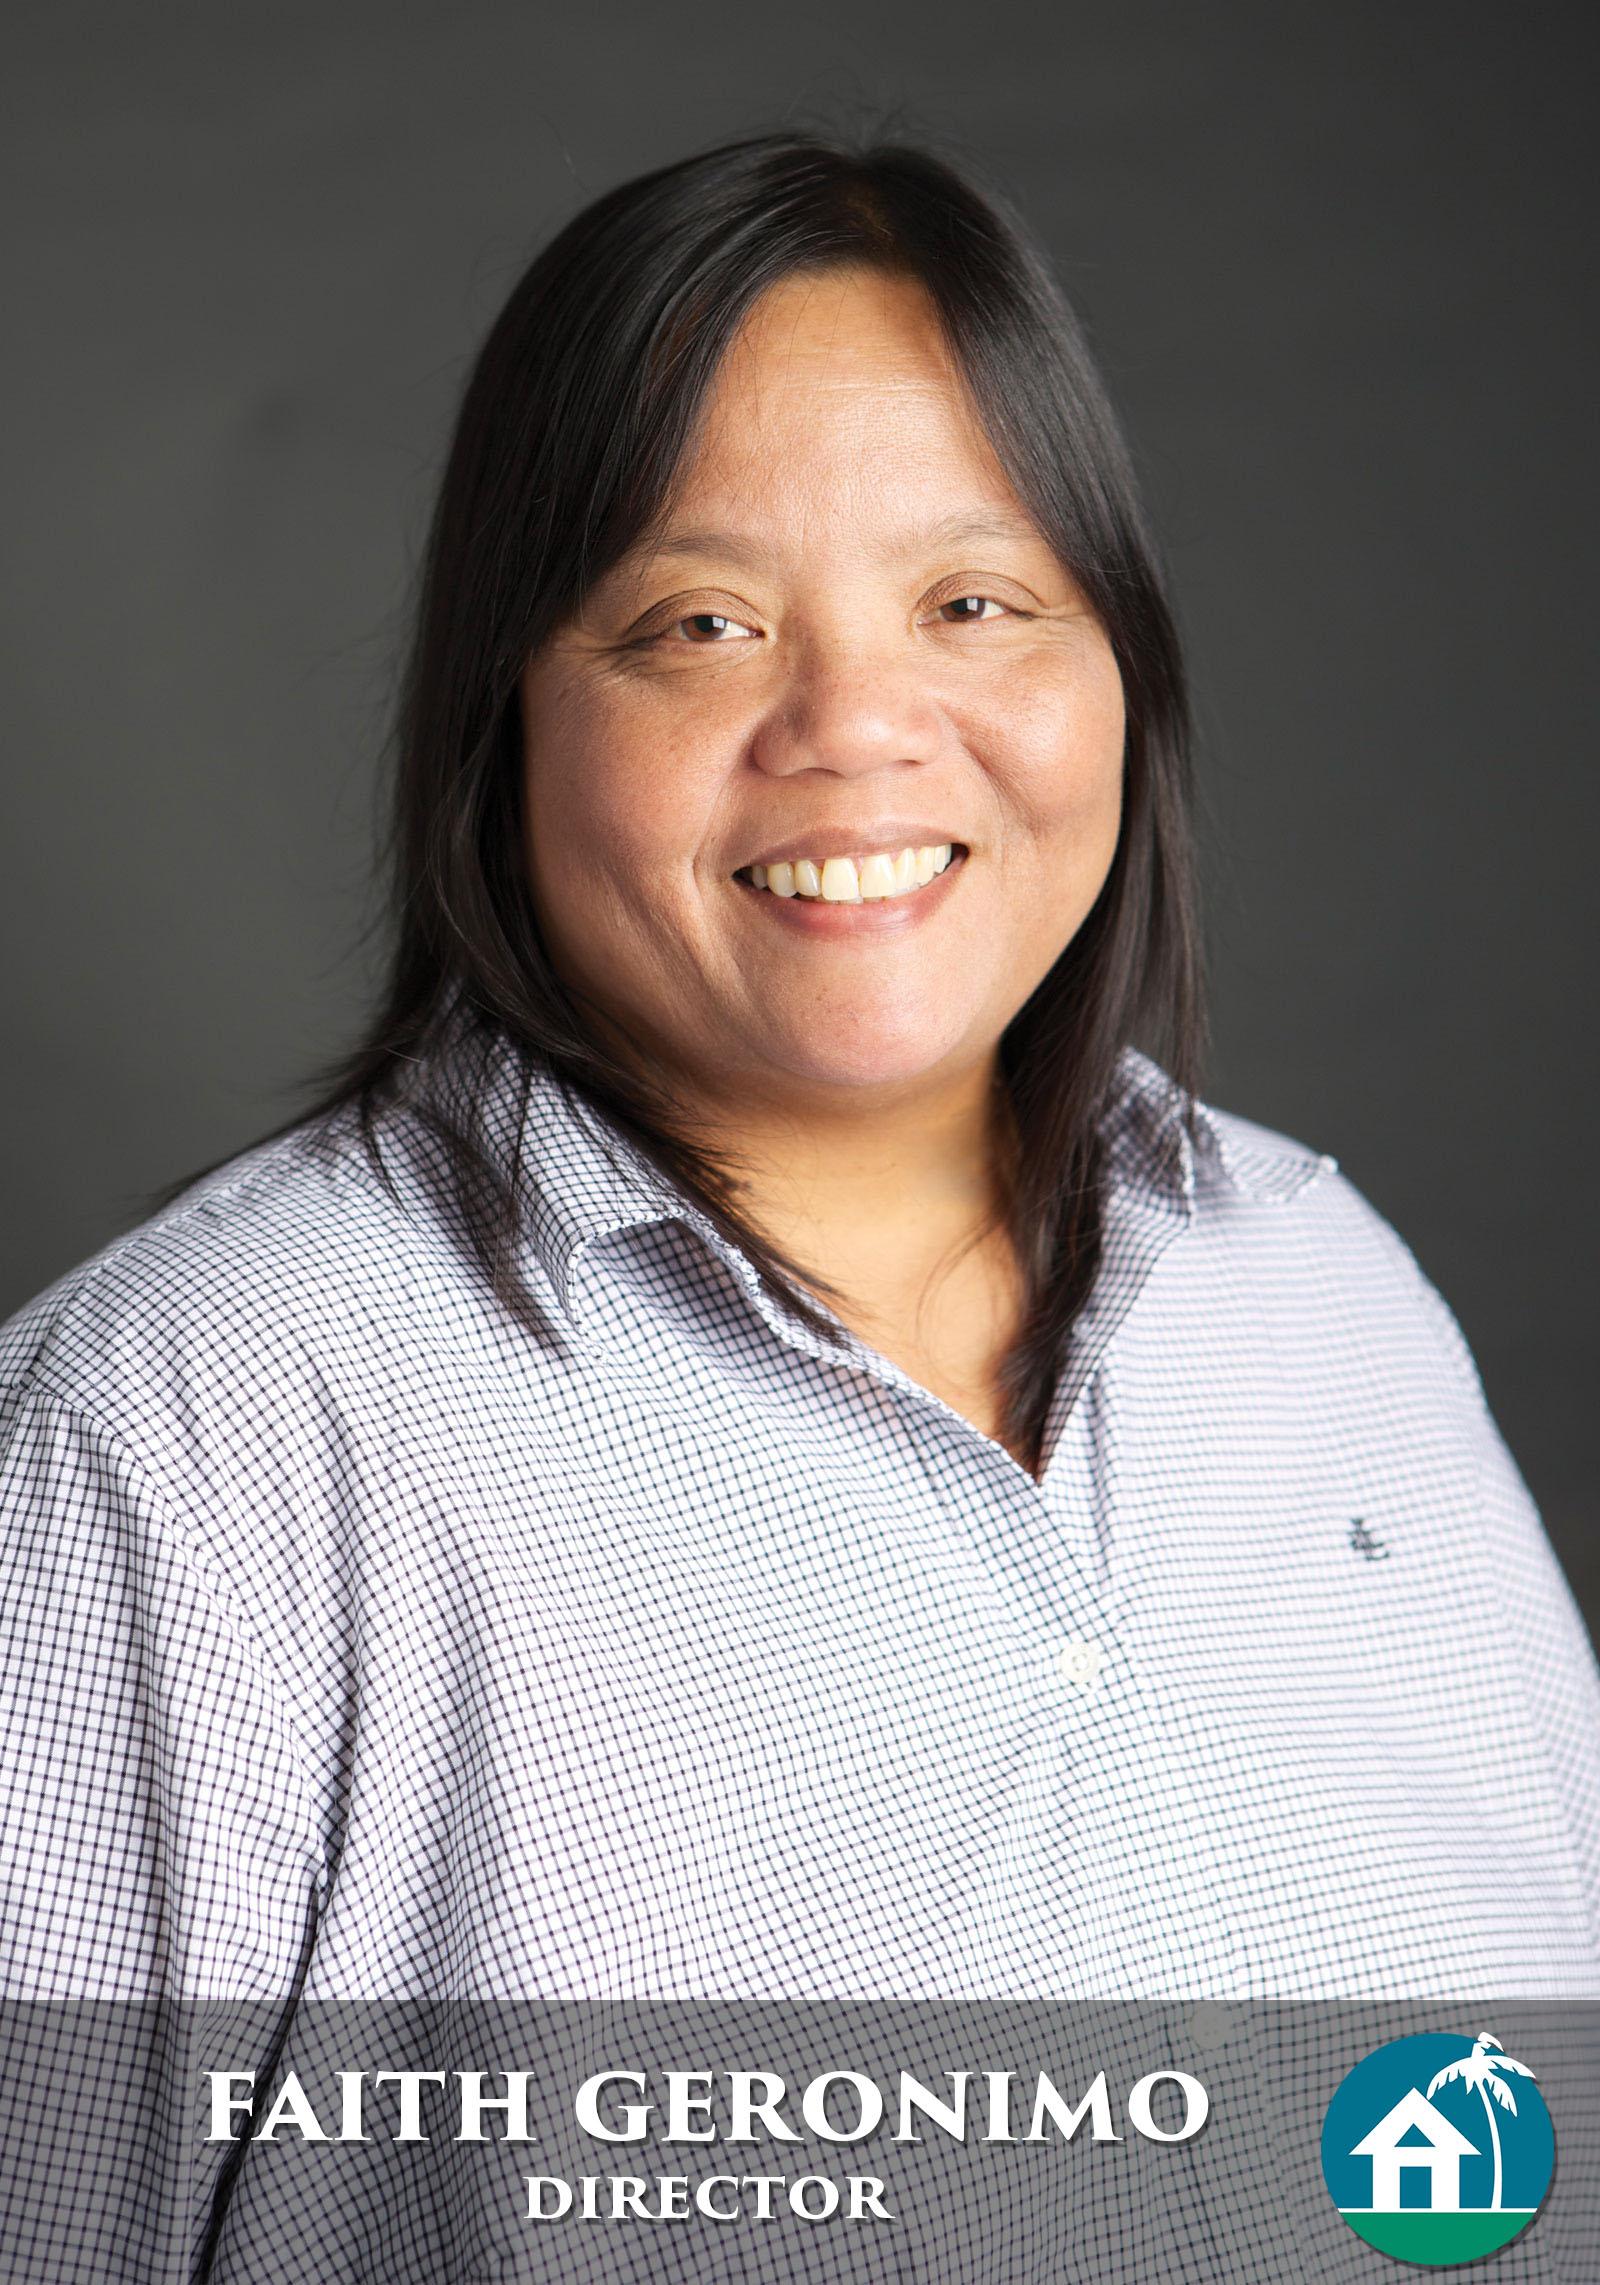 Board of Director, Faith Geronimo, on behalf of Hawaii Information Service